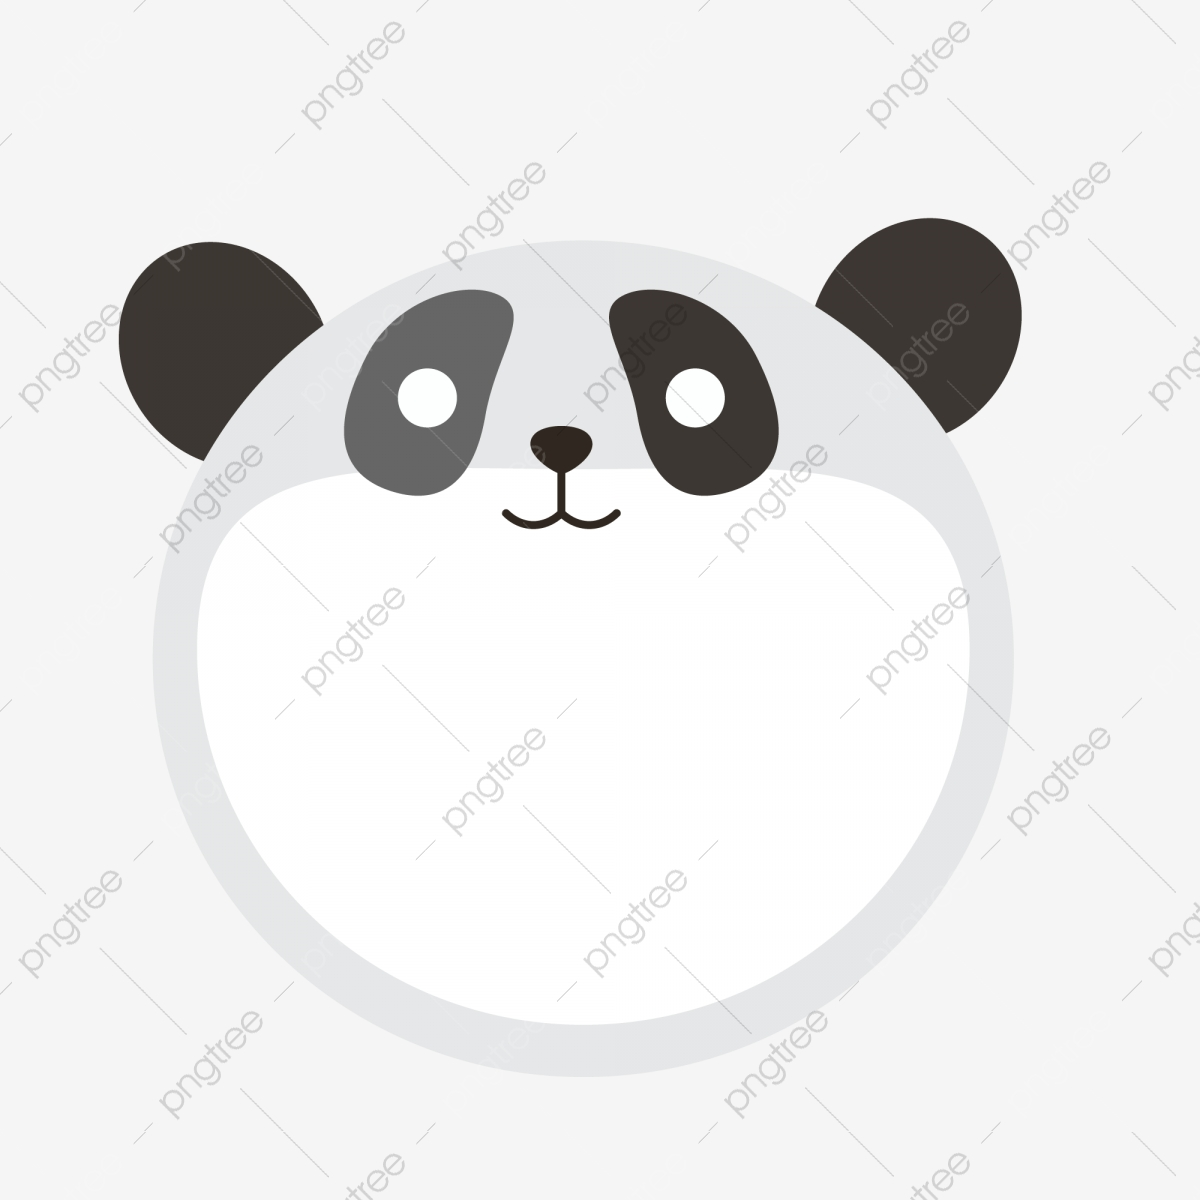 Gambar Perbatasan Panda Binatang Yang Lucu Menyenangkan Binatang Kecil Panda Binatang Png Dan Vektor Dengan Latar Belakang Transparan Untuk Unduh Gratis